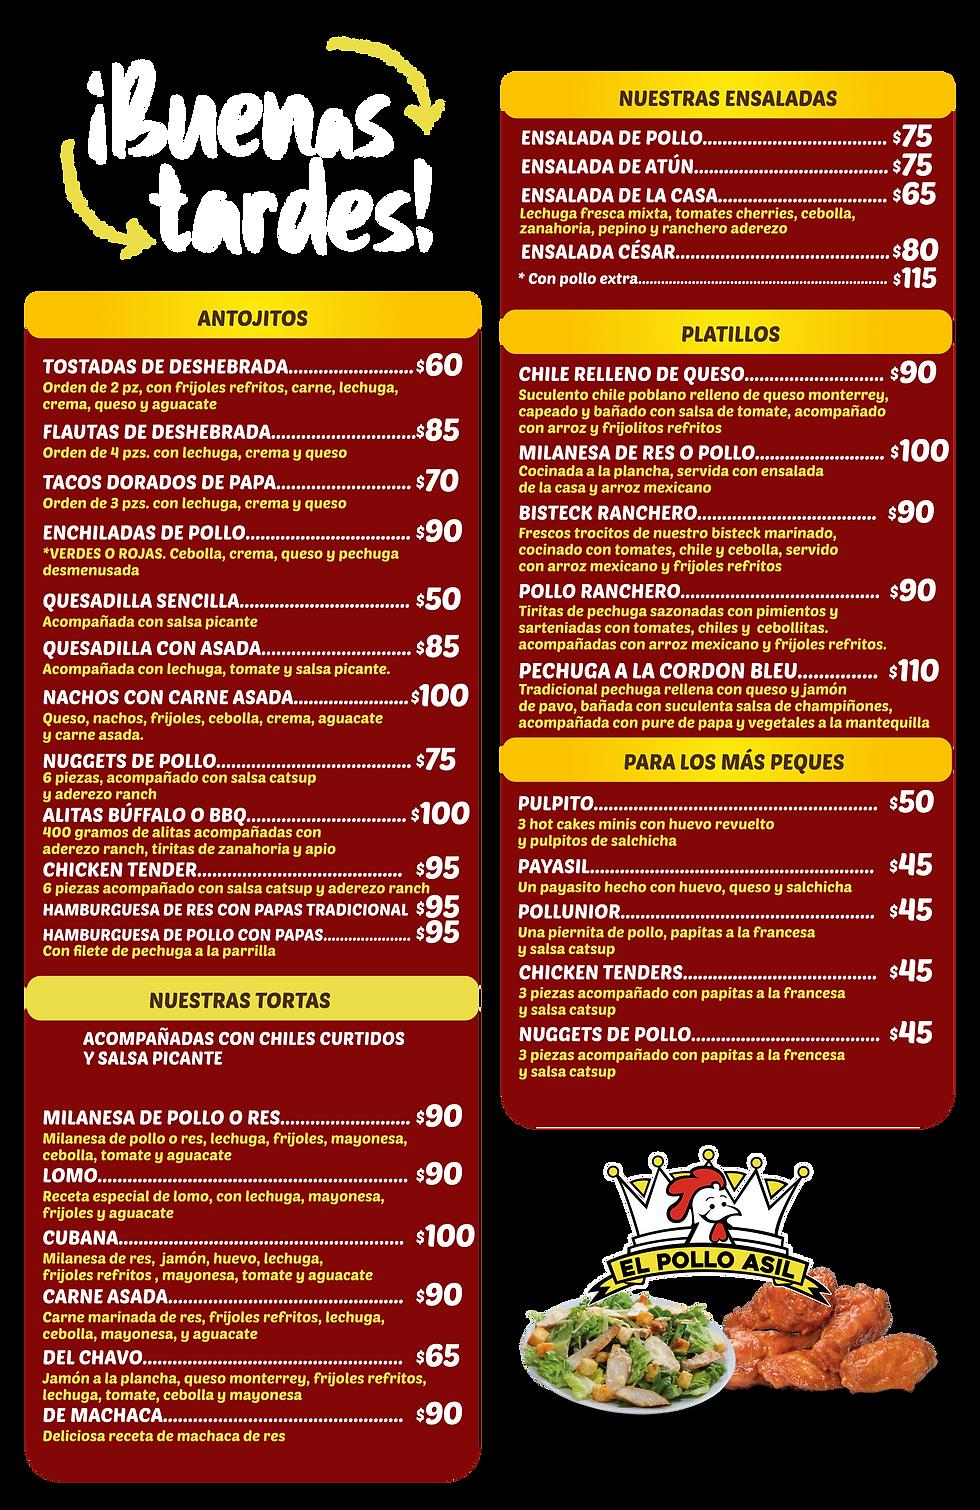 Pollo asil_Cambios precios web_2021-07.png